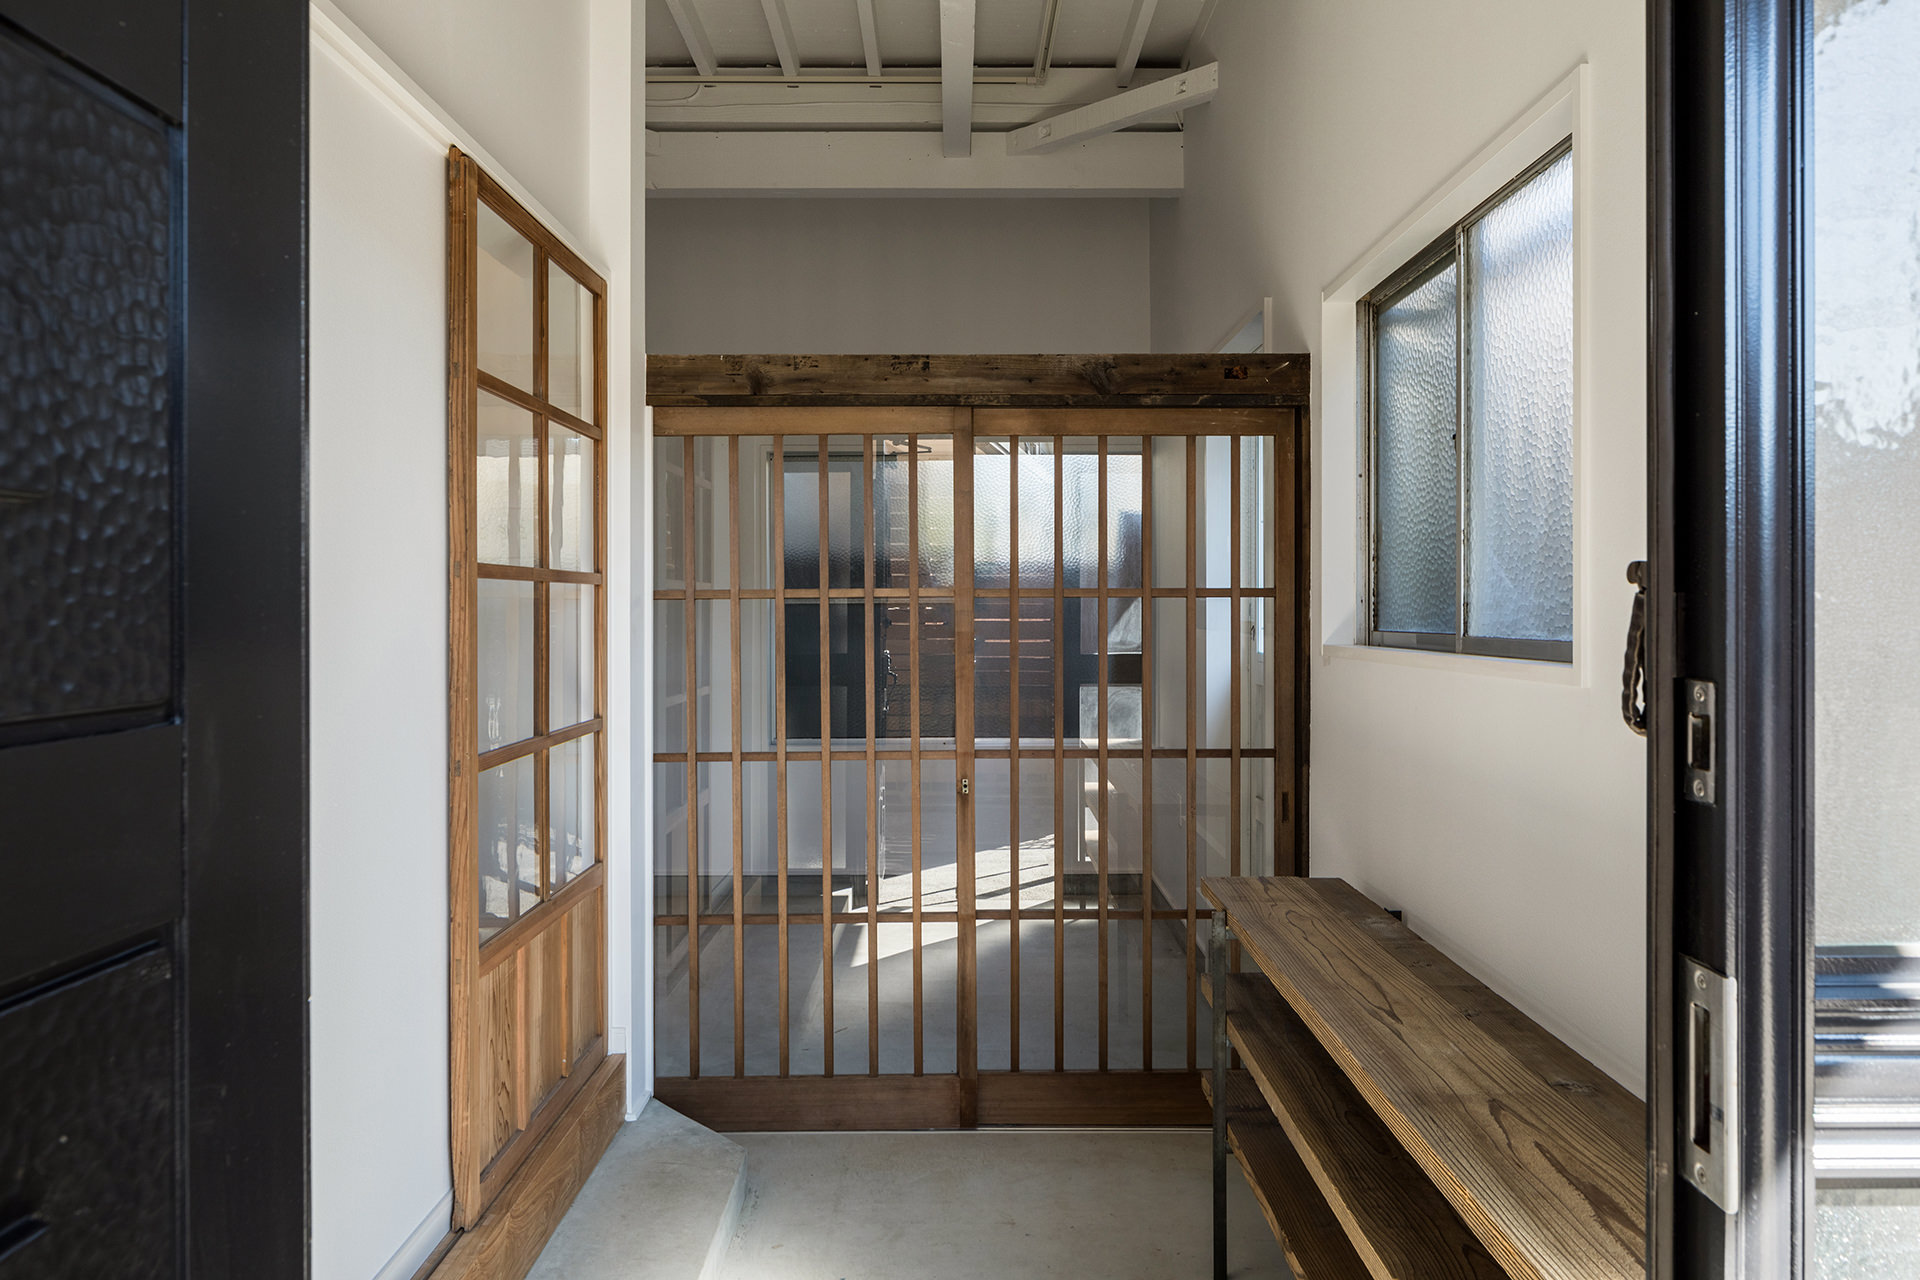 stri-ep house* 由比ヶ浜 イメージ1 撮影:東涌宏和